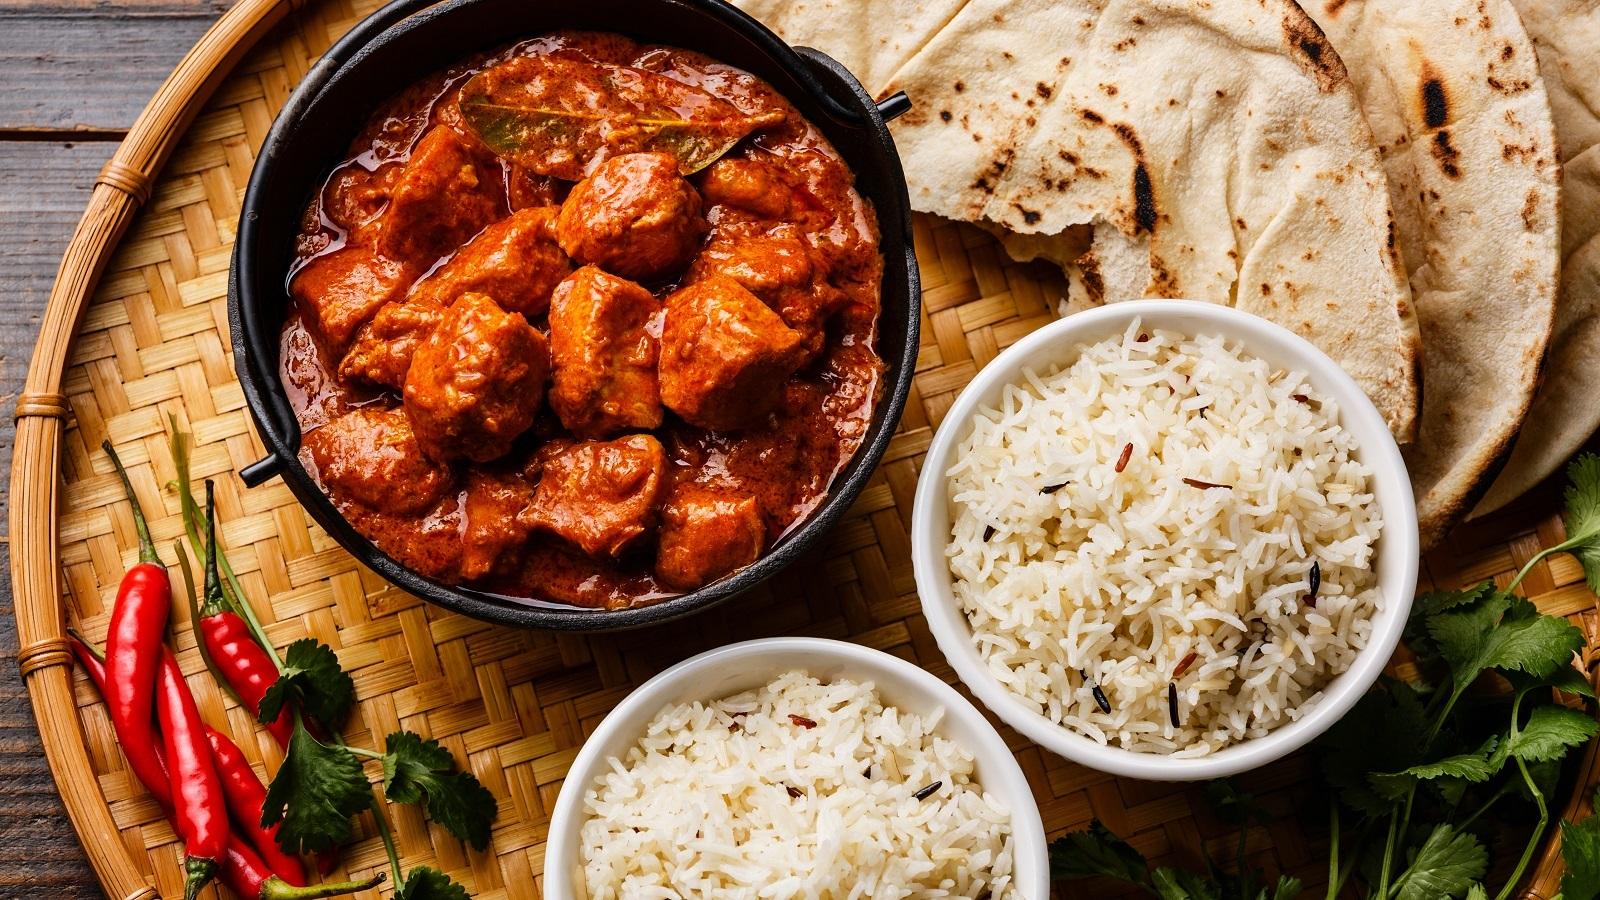 Asghar Restaurant